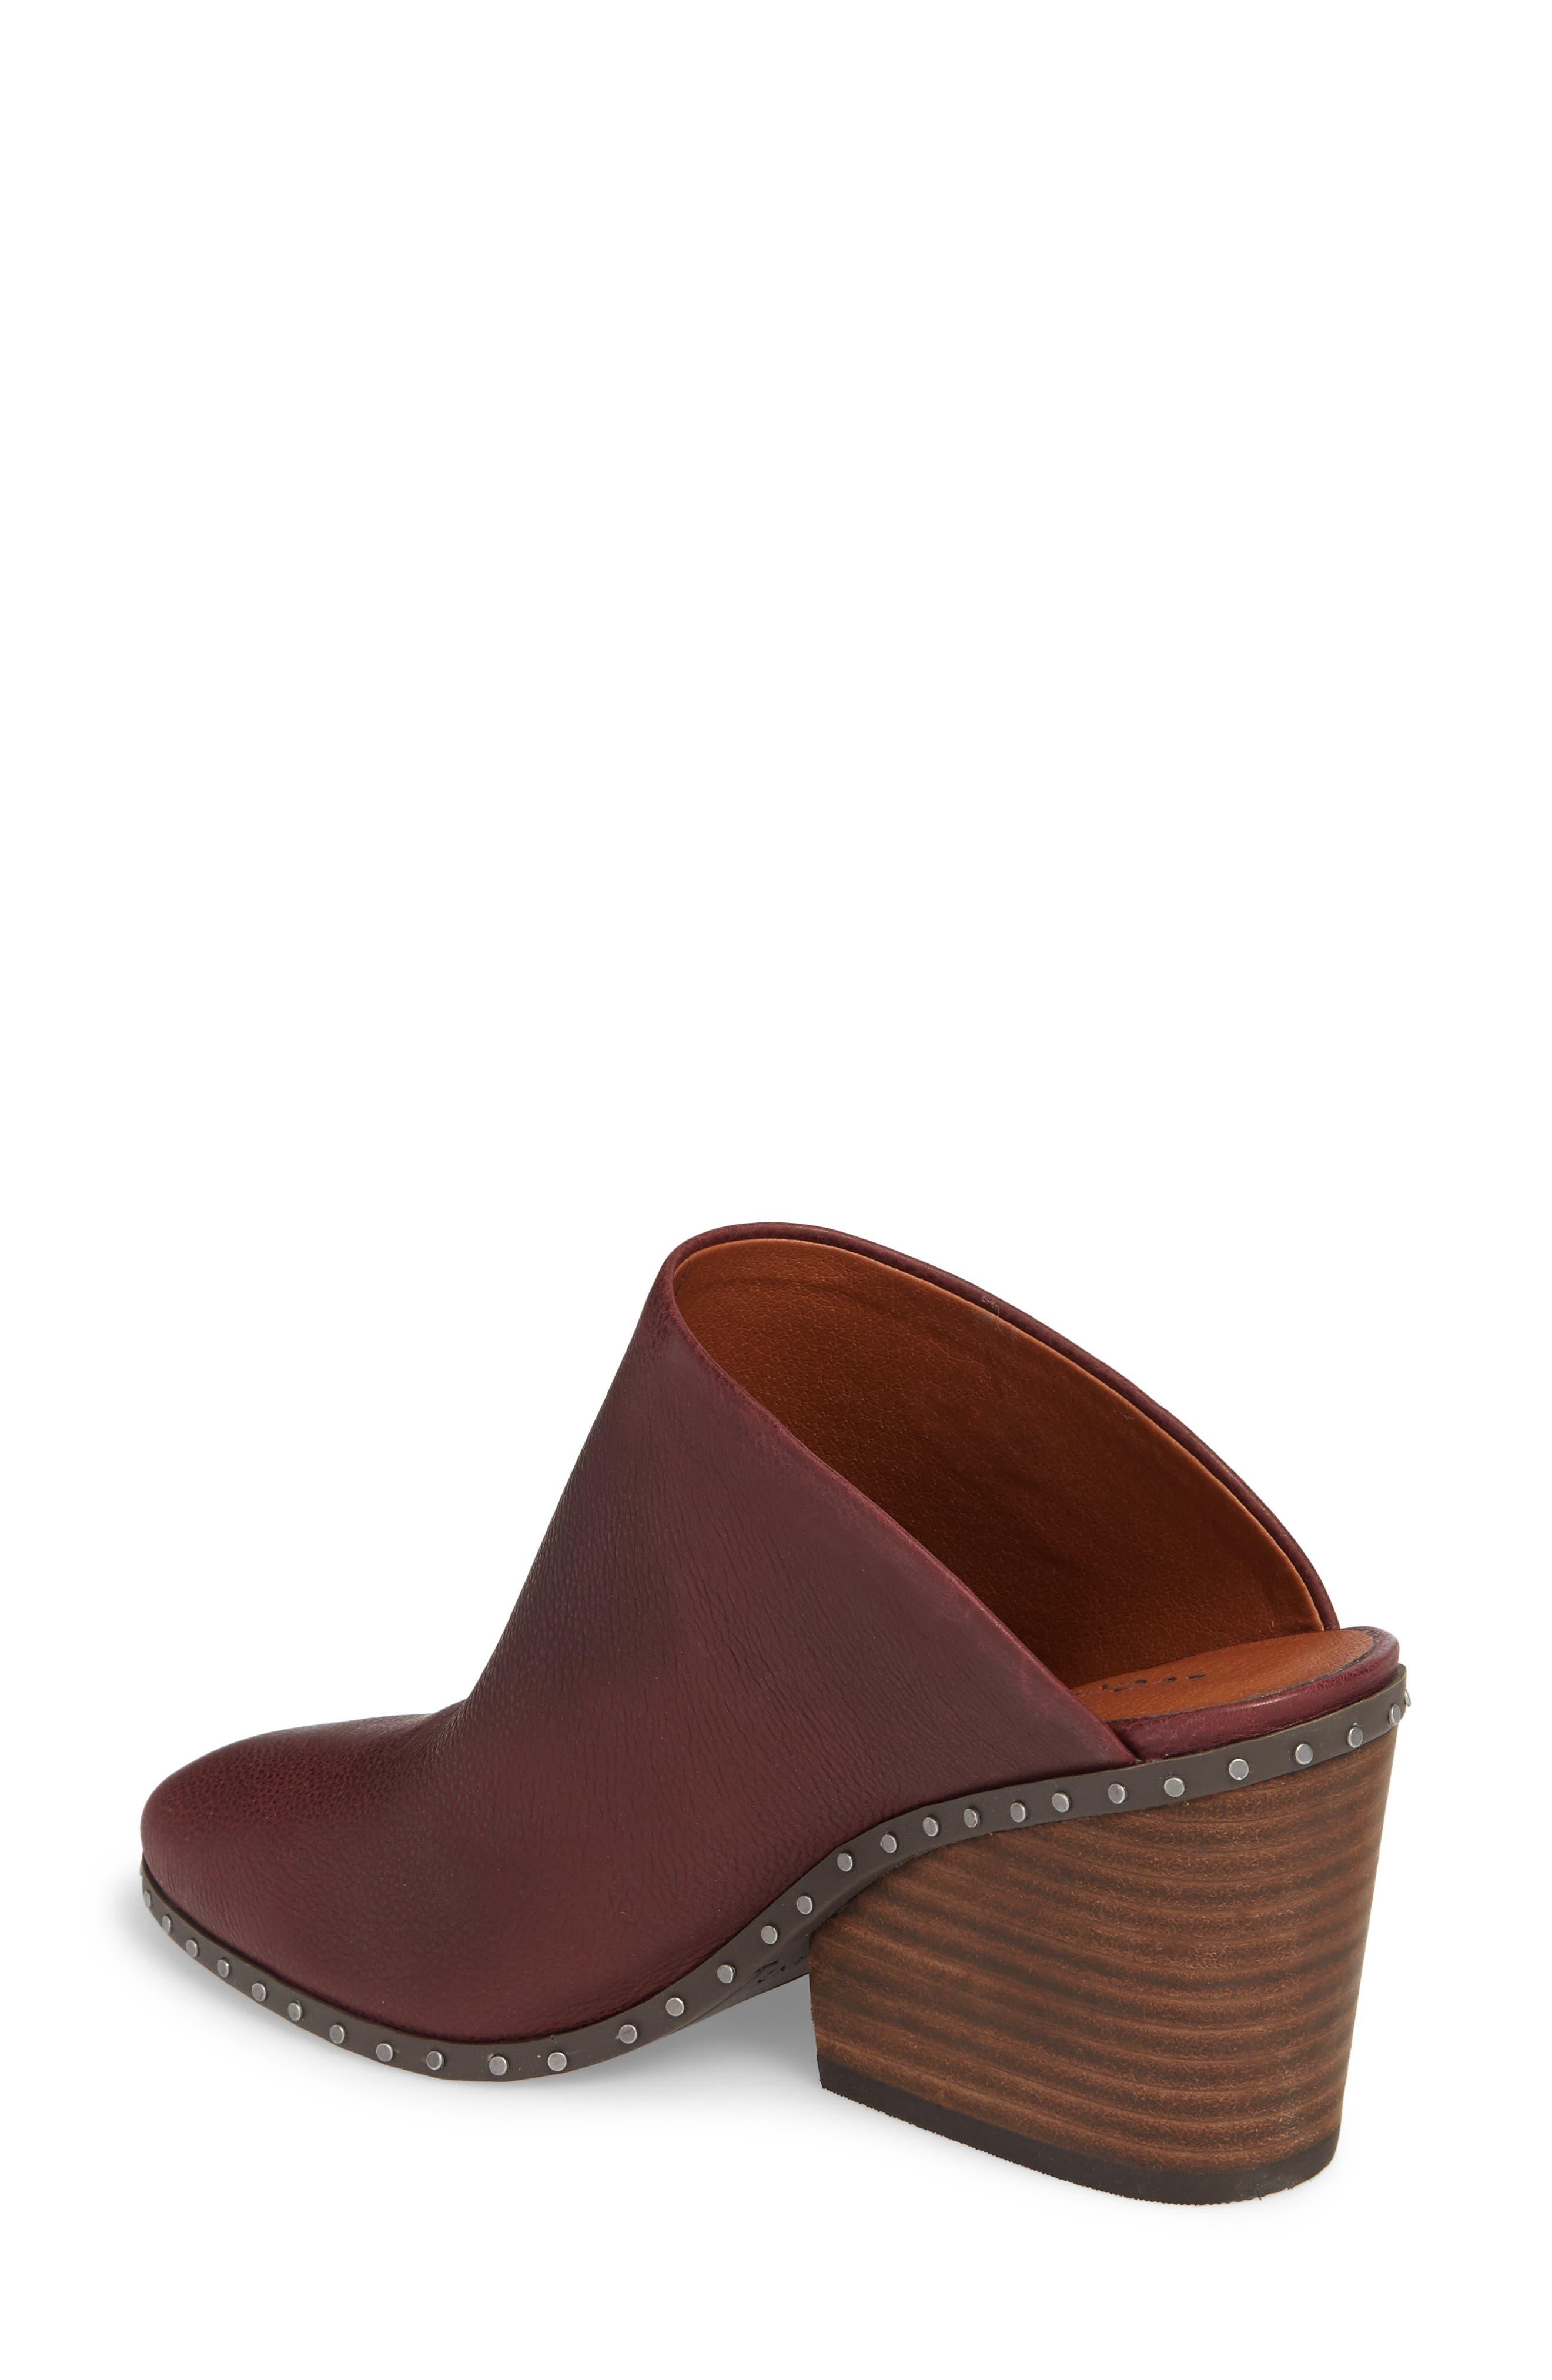 Larsson2 Studded Mule,                             Alternate thumbnail 2, color,                             Tawny Port Leather